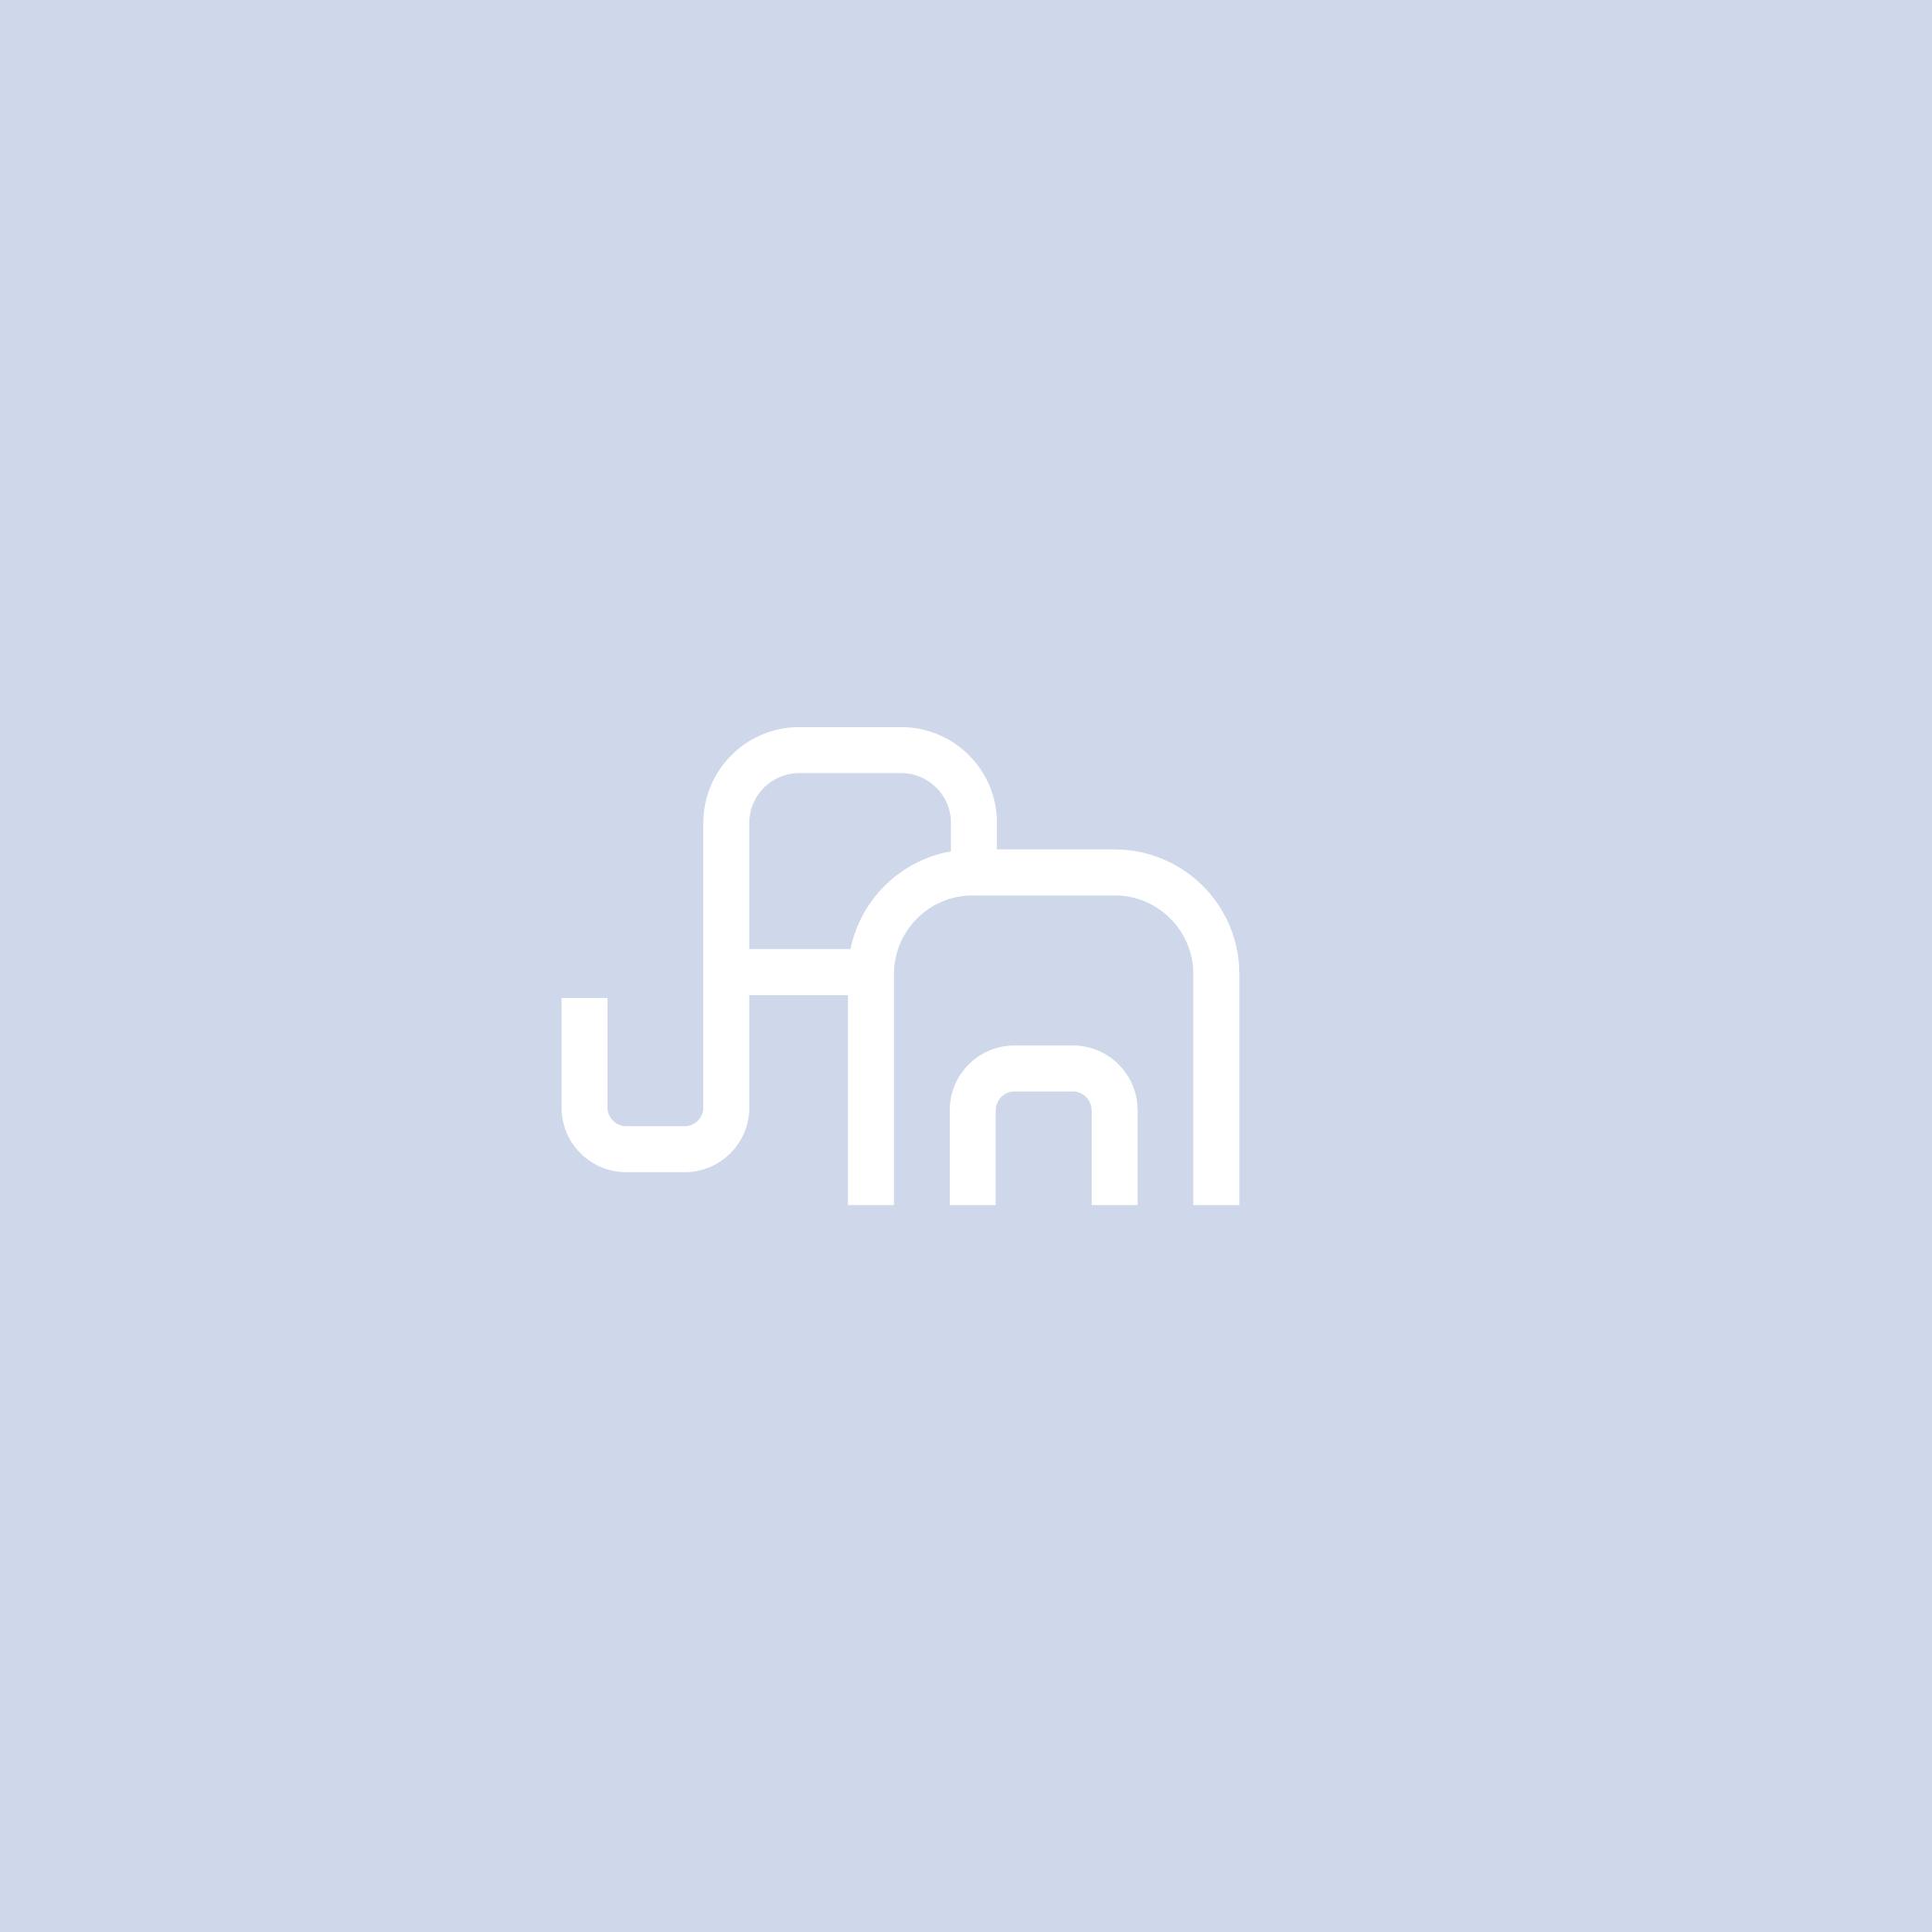 Minimal Elephant Logo - Apollo Creative Co - Hampshire Graphic Design